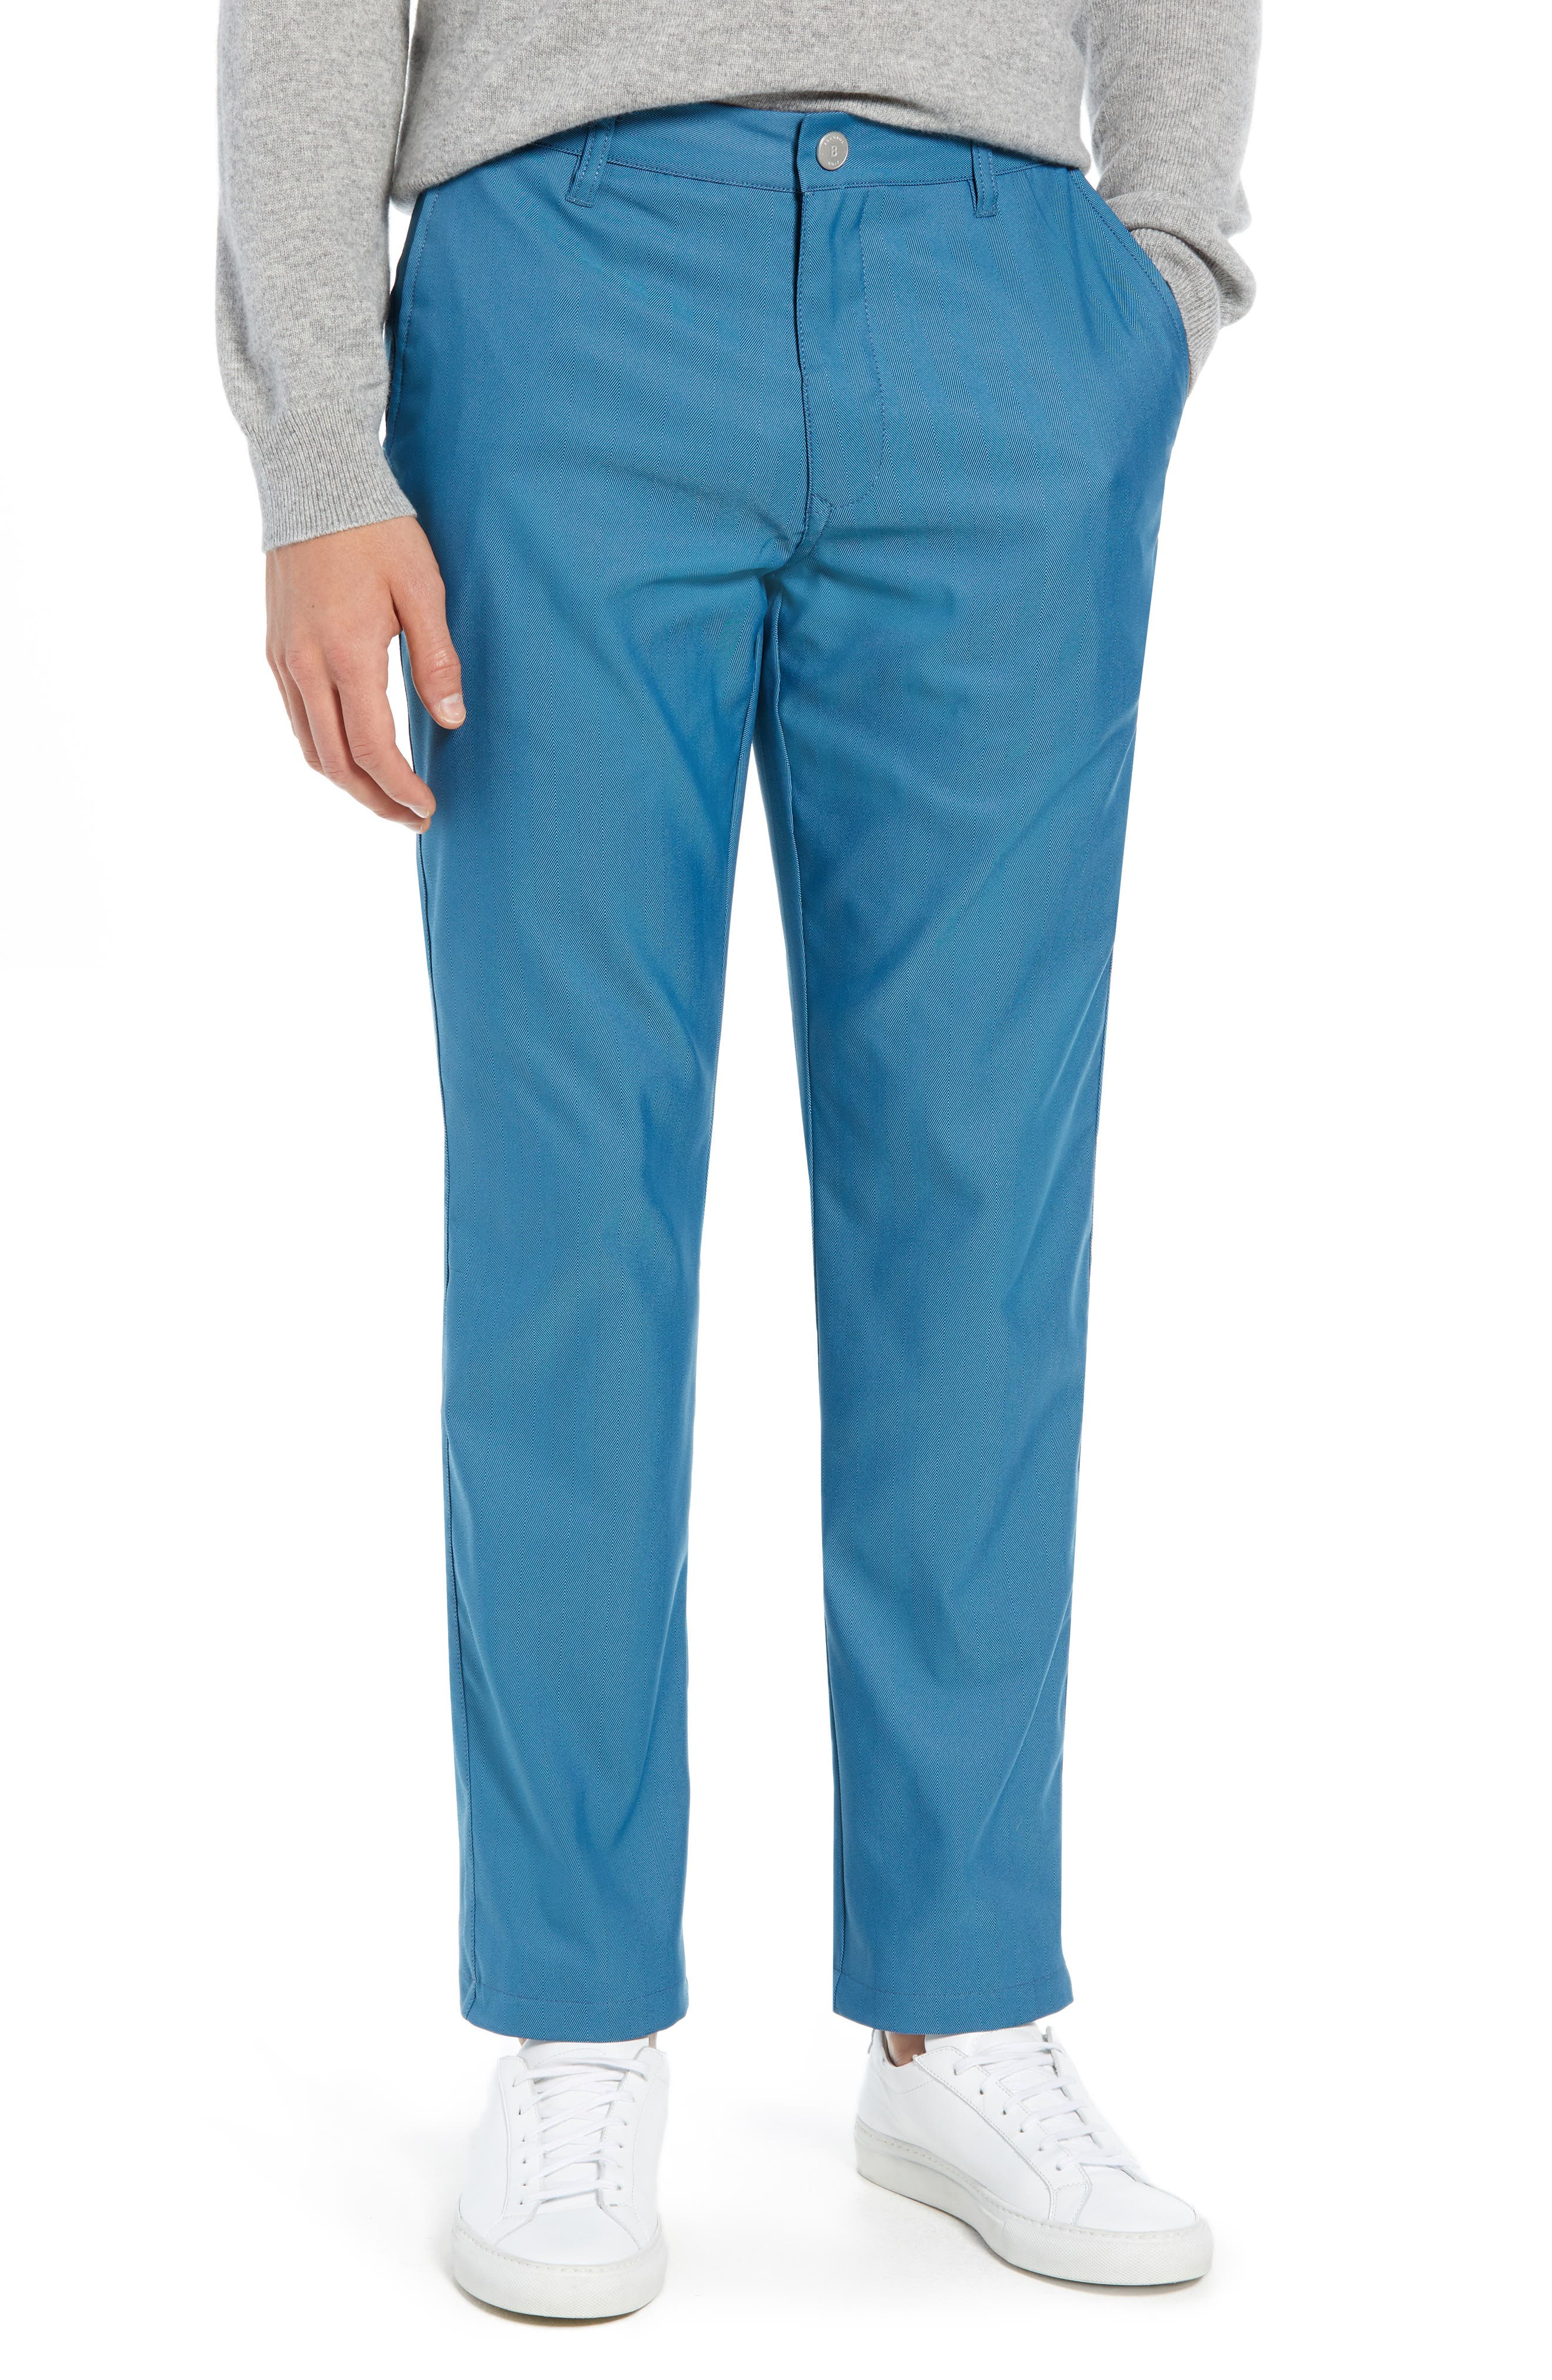 Highland Slim Fit Golf Pants,                             Main thumbnail 1, color,                             400